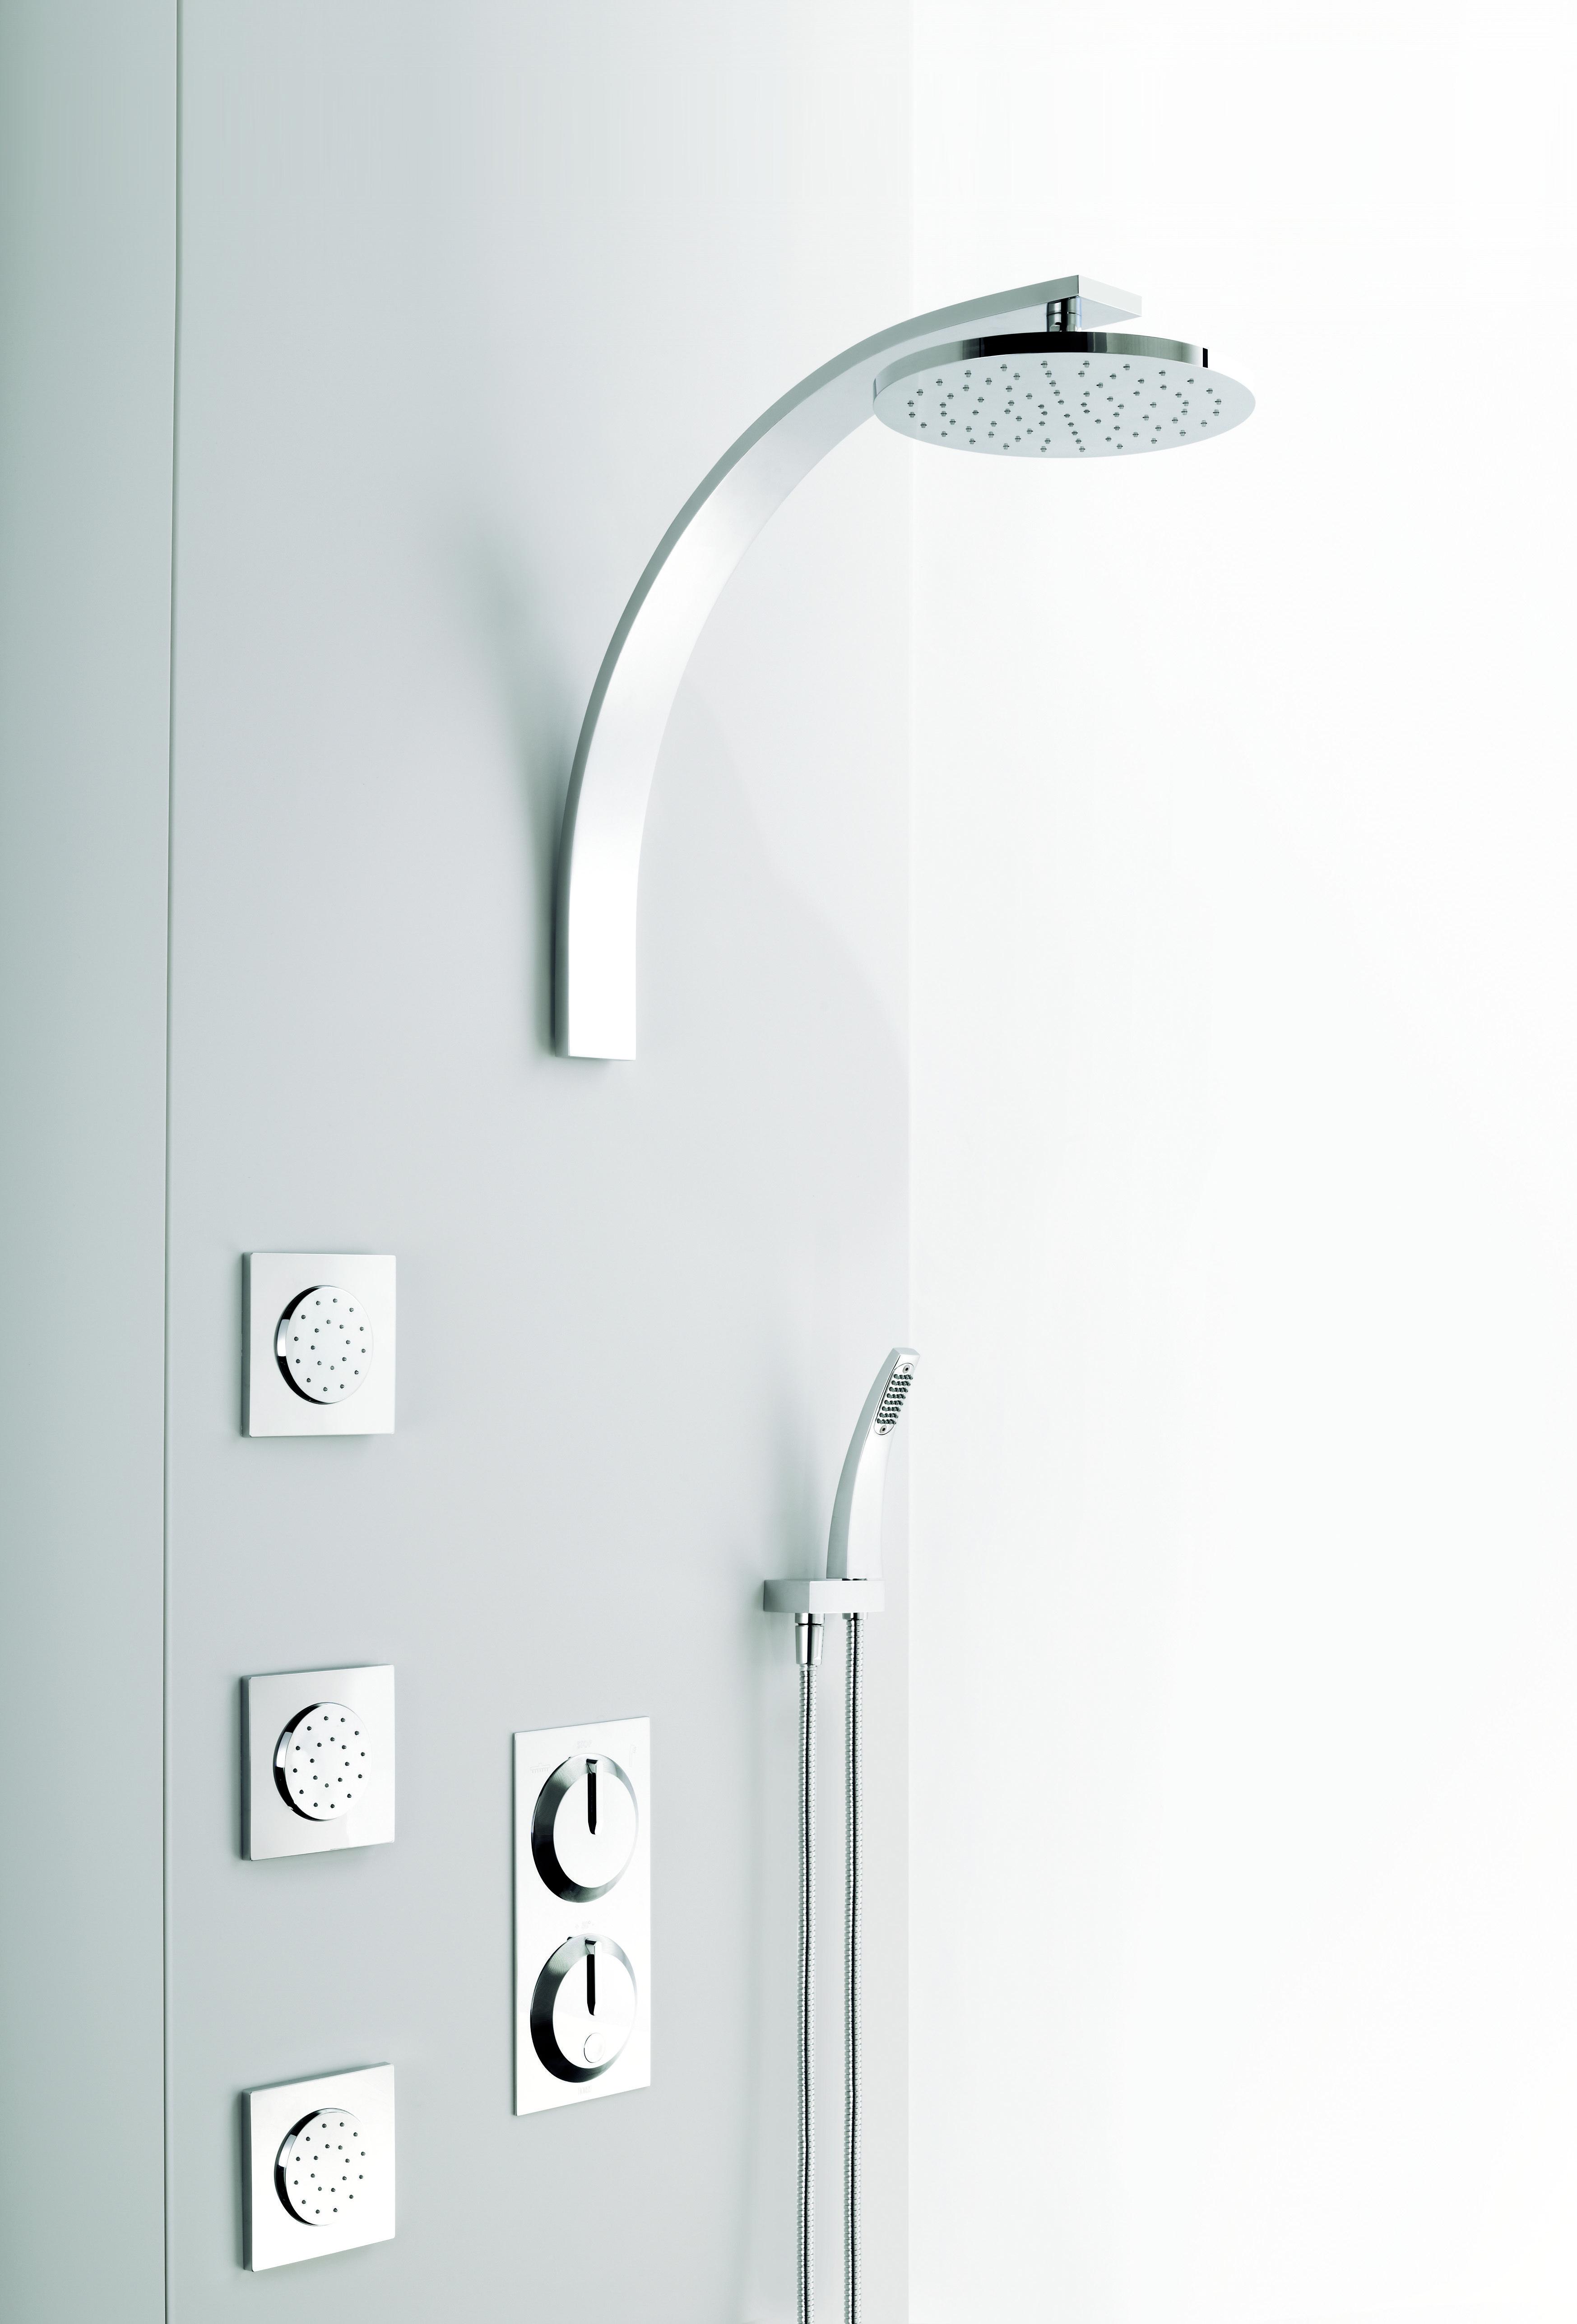 Nouvelle vague bathroom horus france bathroom salle de bain douche robinetterie - Horus robinetterie cuisine ...